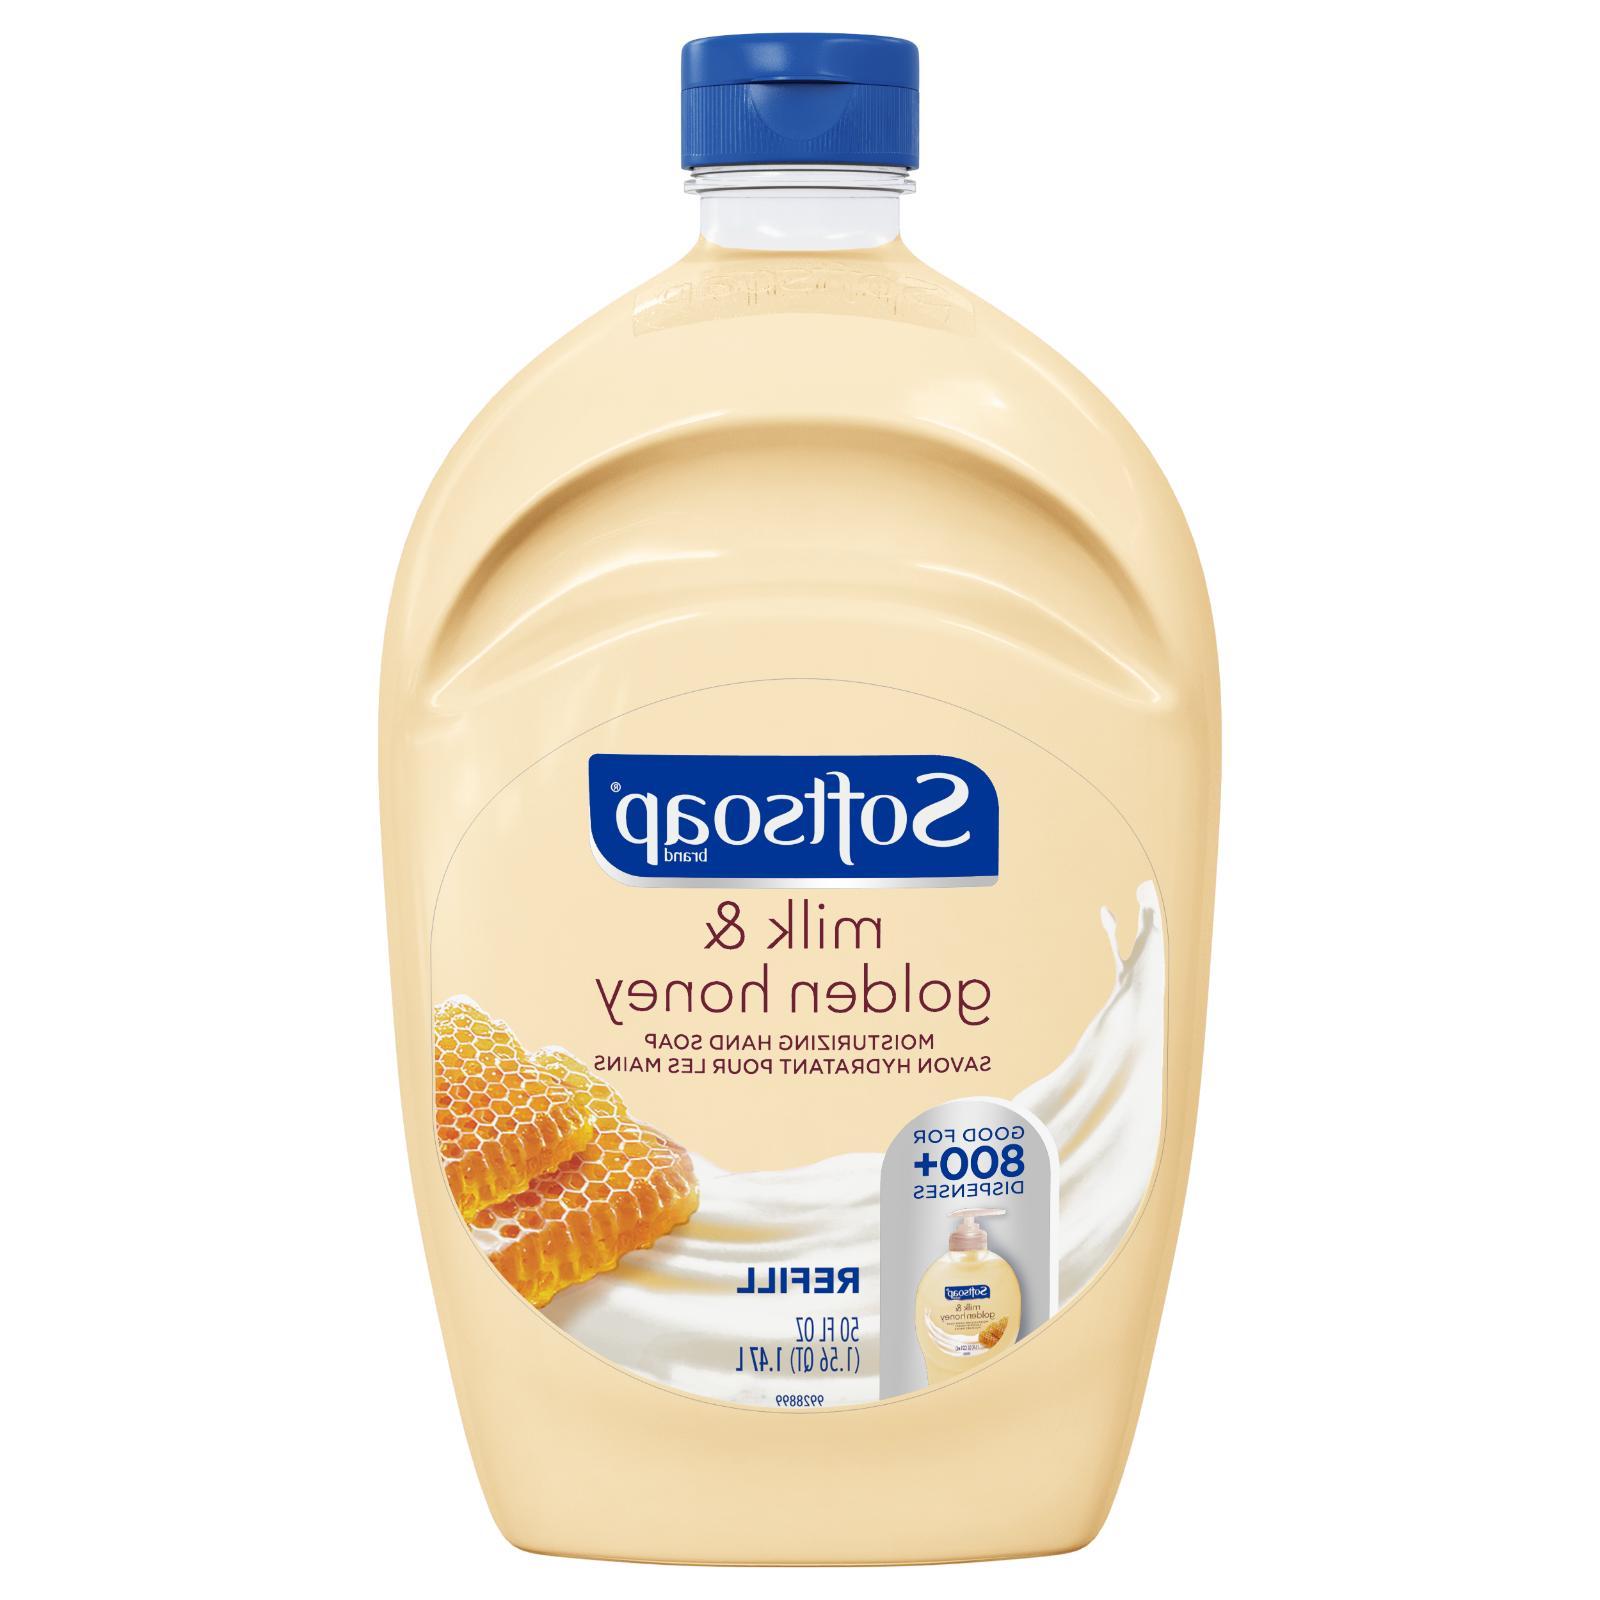 Softsoap Refill Soap Golden Honey